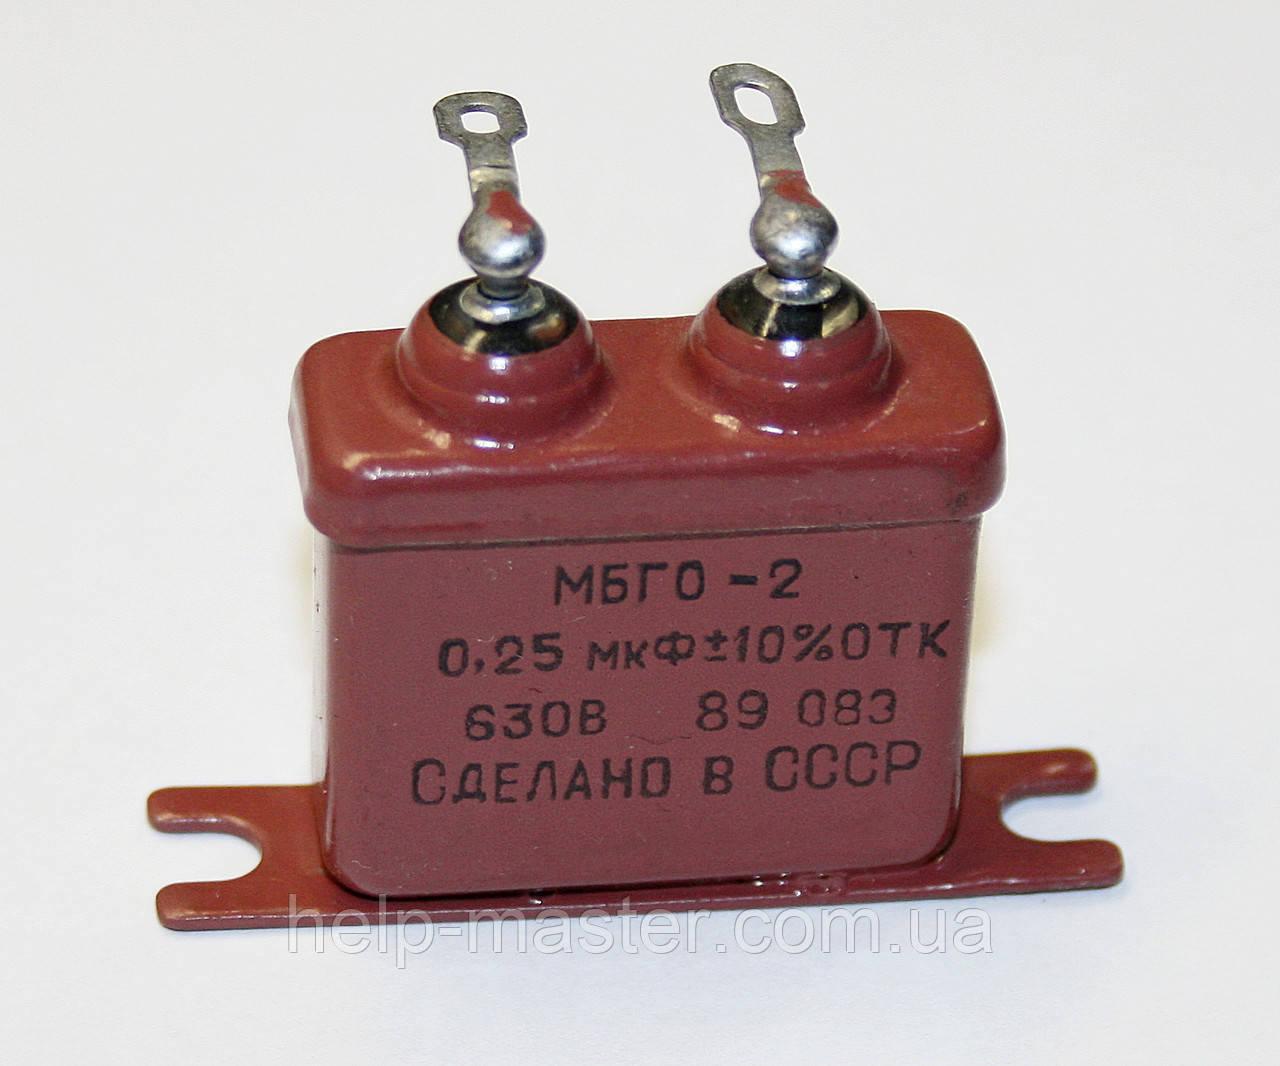 Конденсатор МБГО-2 0,25 мкф 630В